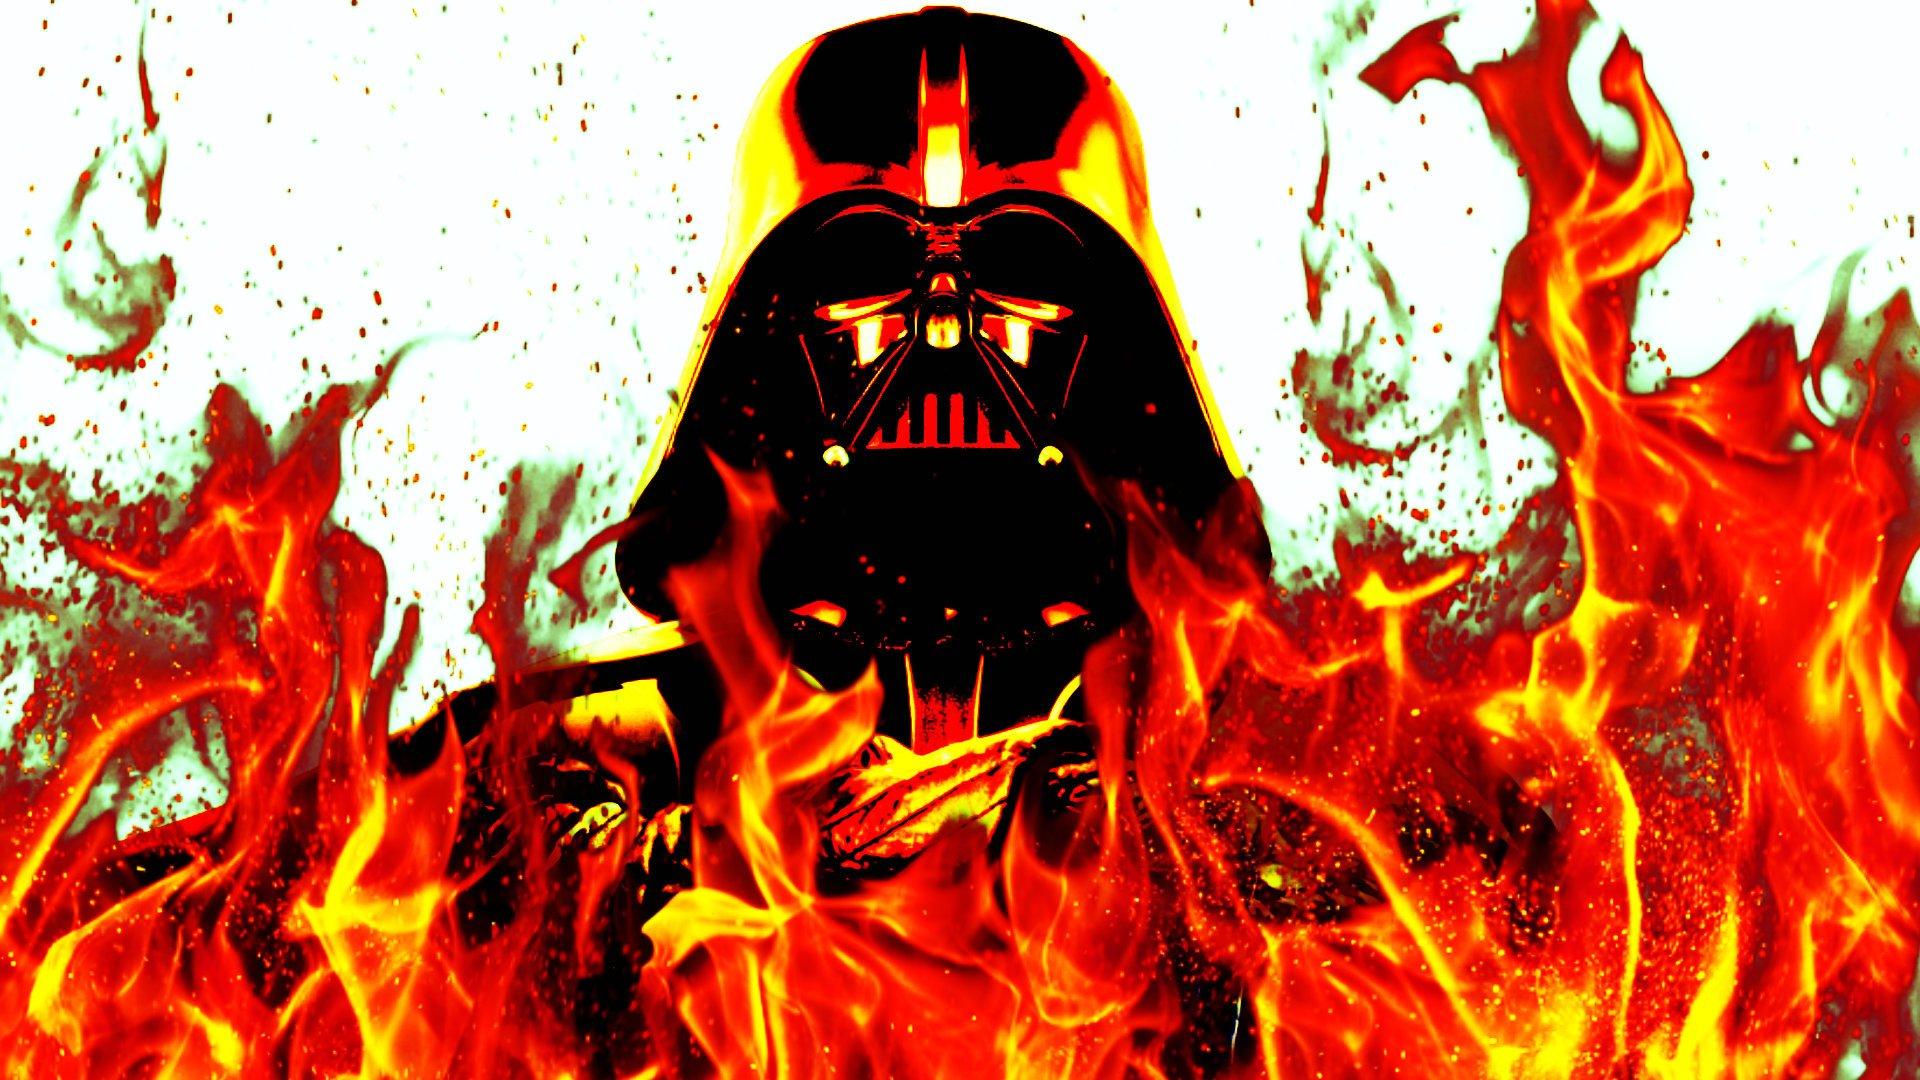 Sci Fi - Star Wars  Darth Vader Fire Warrior Wallpaper